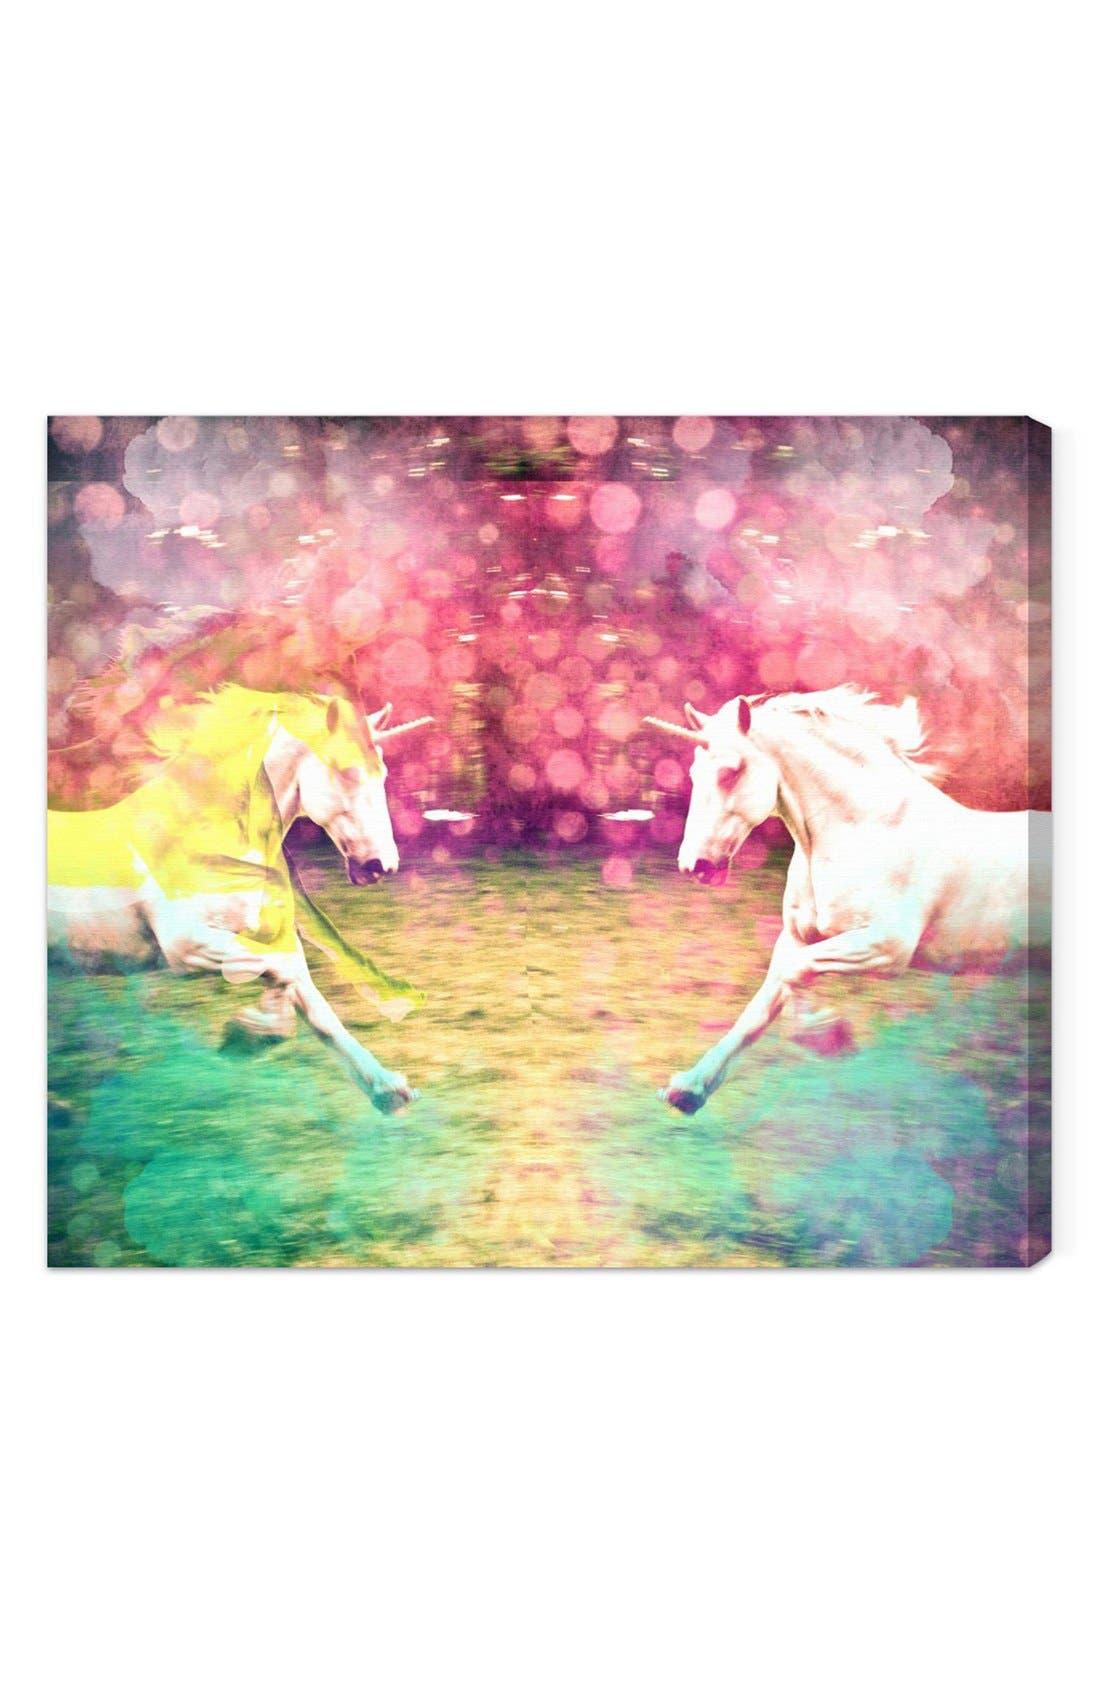 Alternate Image 1 Selected - Oliver Gal 'Unicorns Dusk' Wall Art